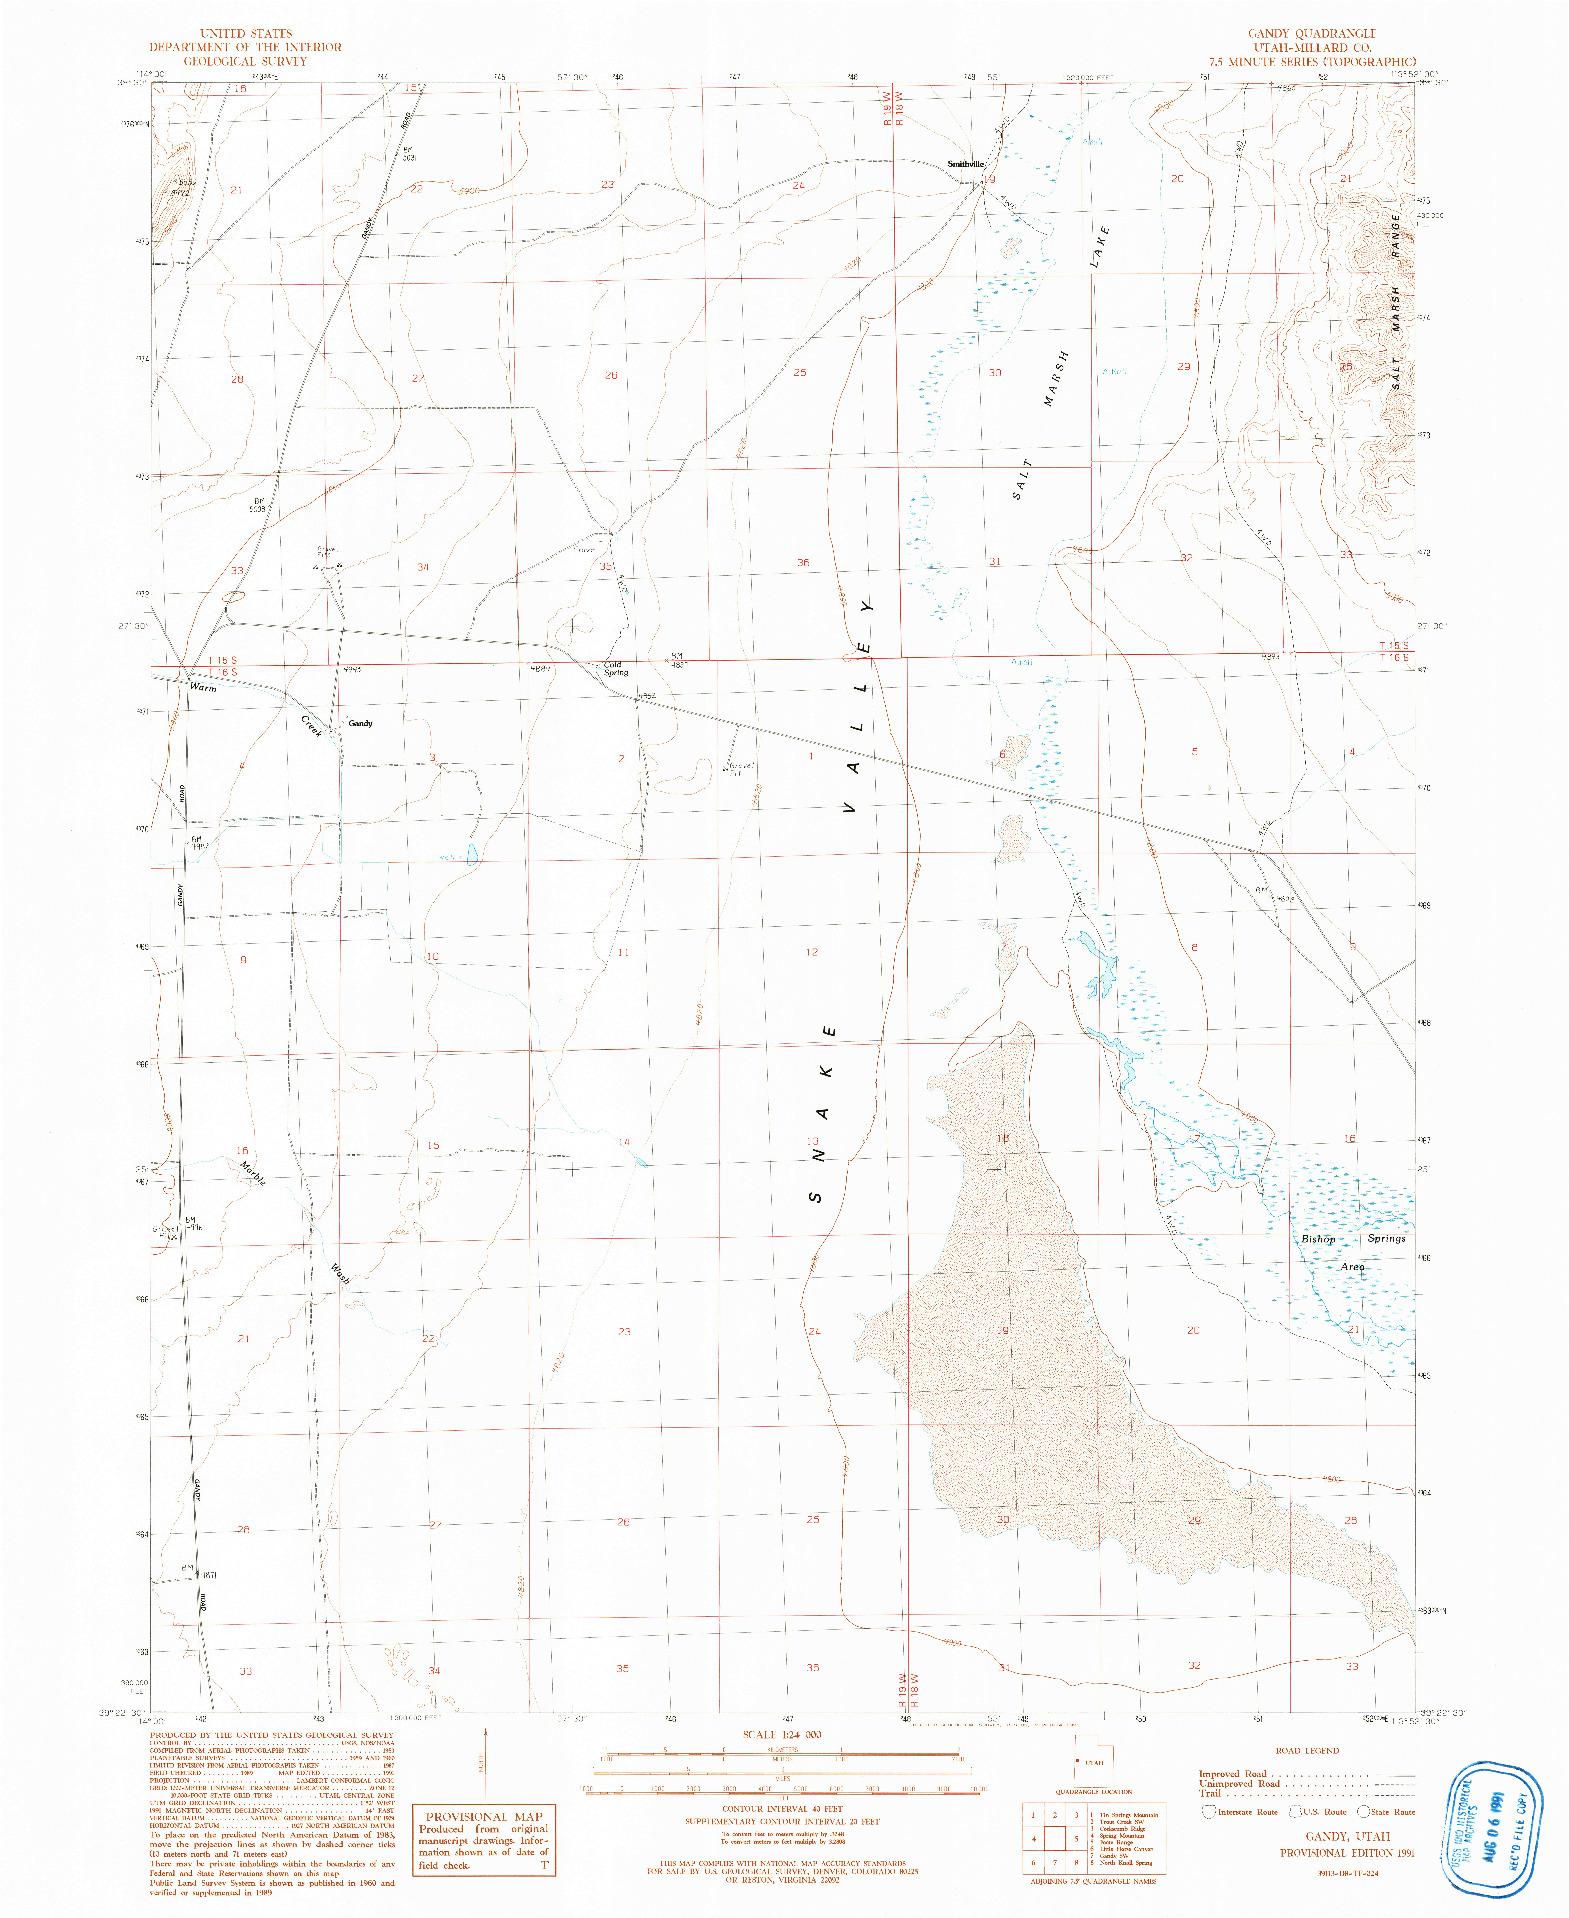 USGS 1:24000-SCALE QUADRANGLE FOR GANDY, UT 1991